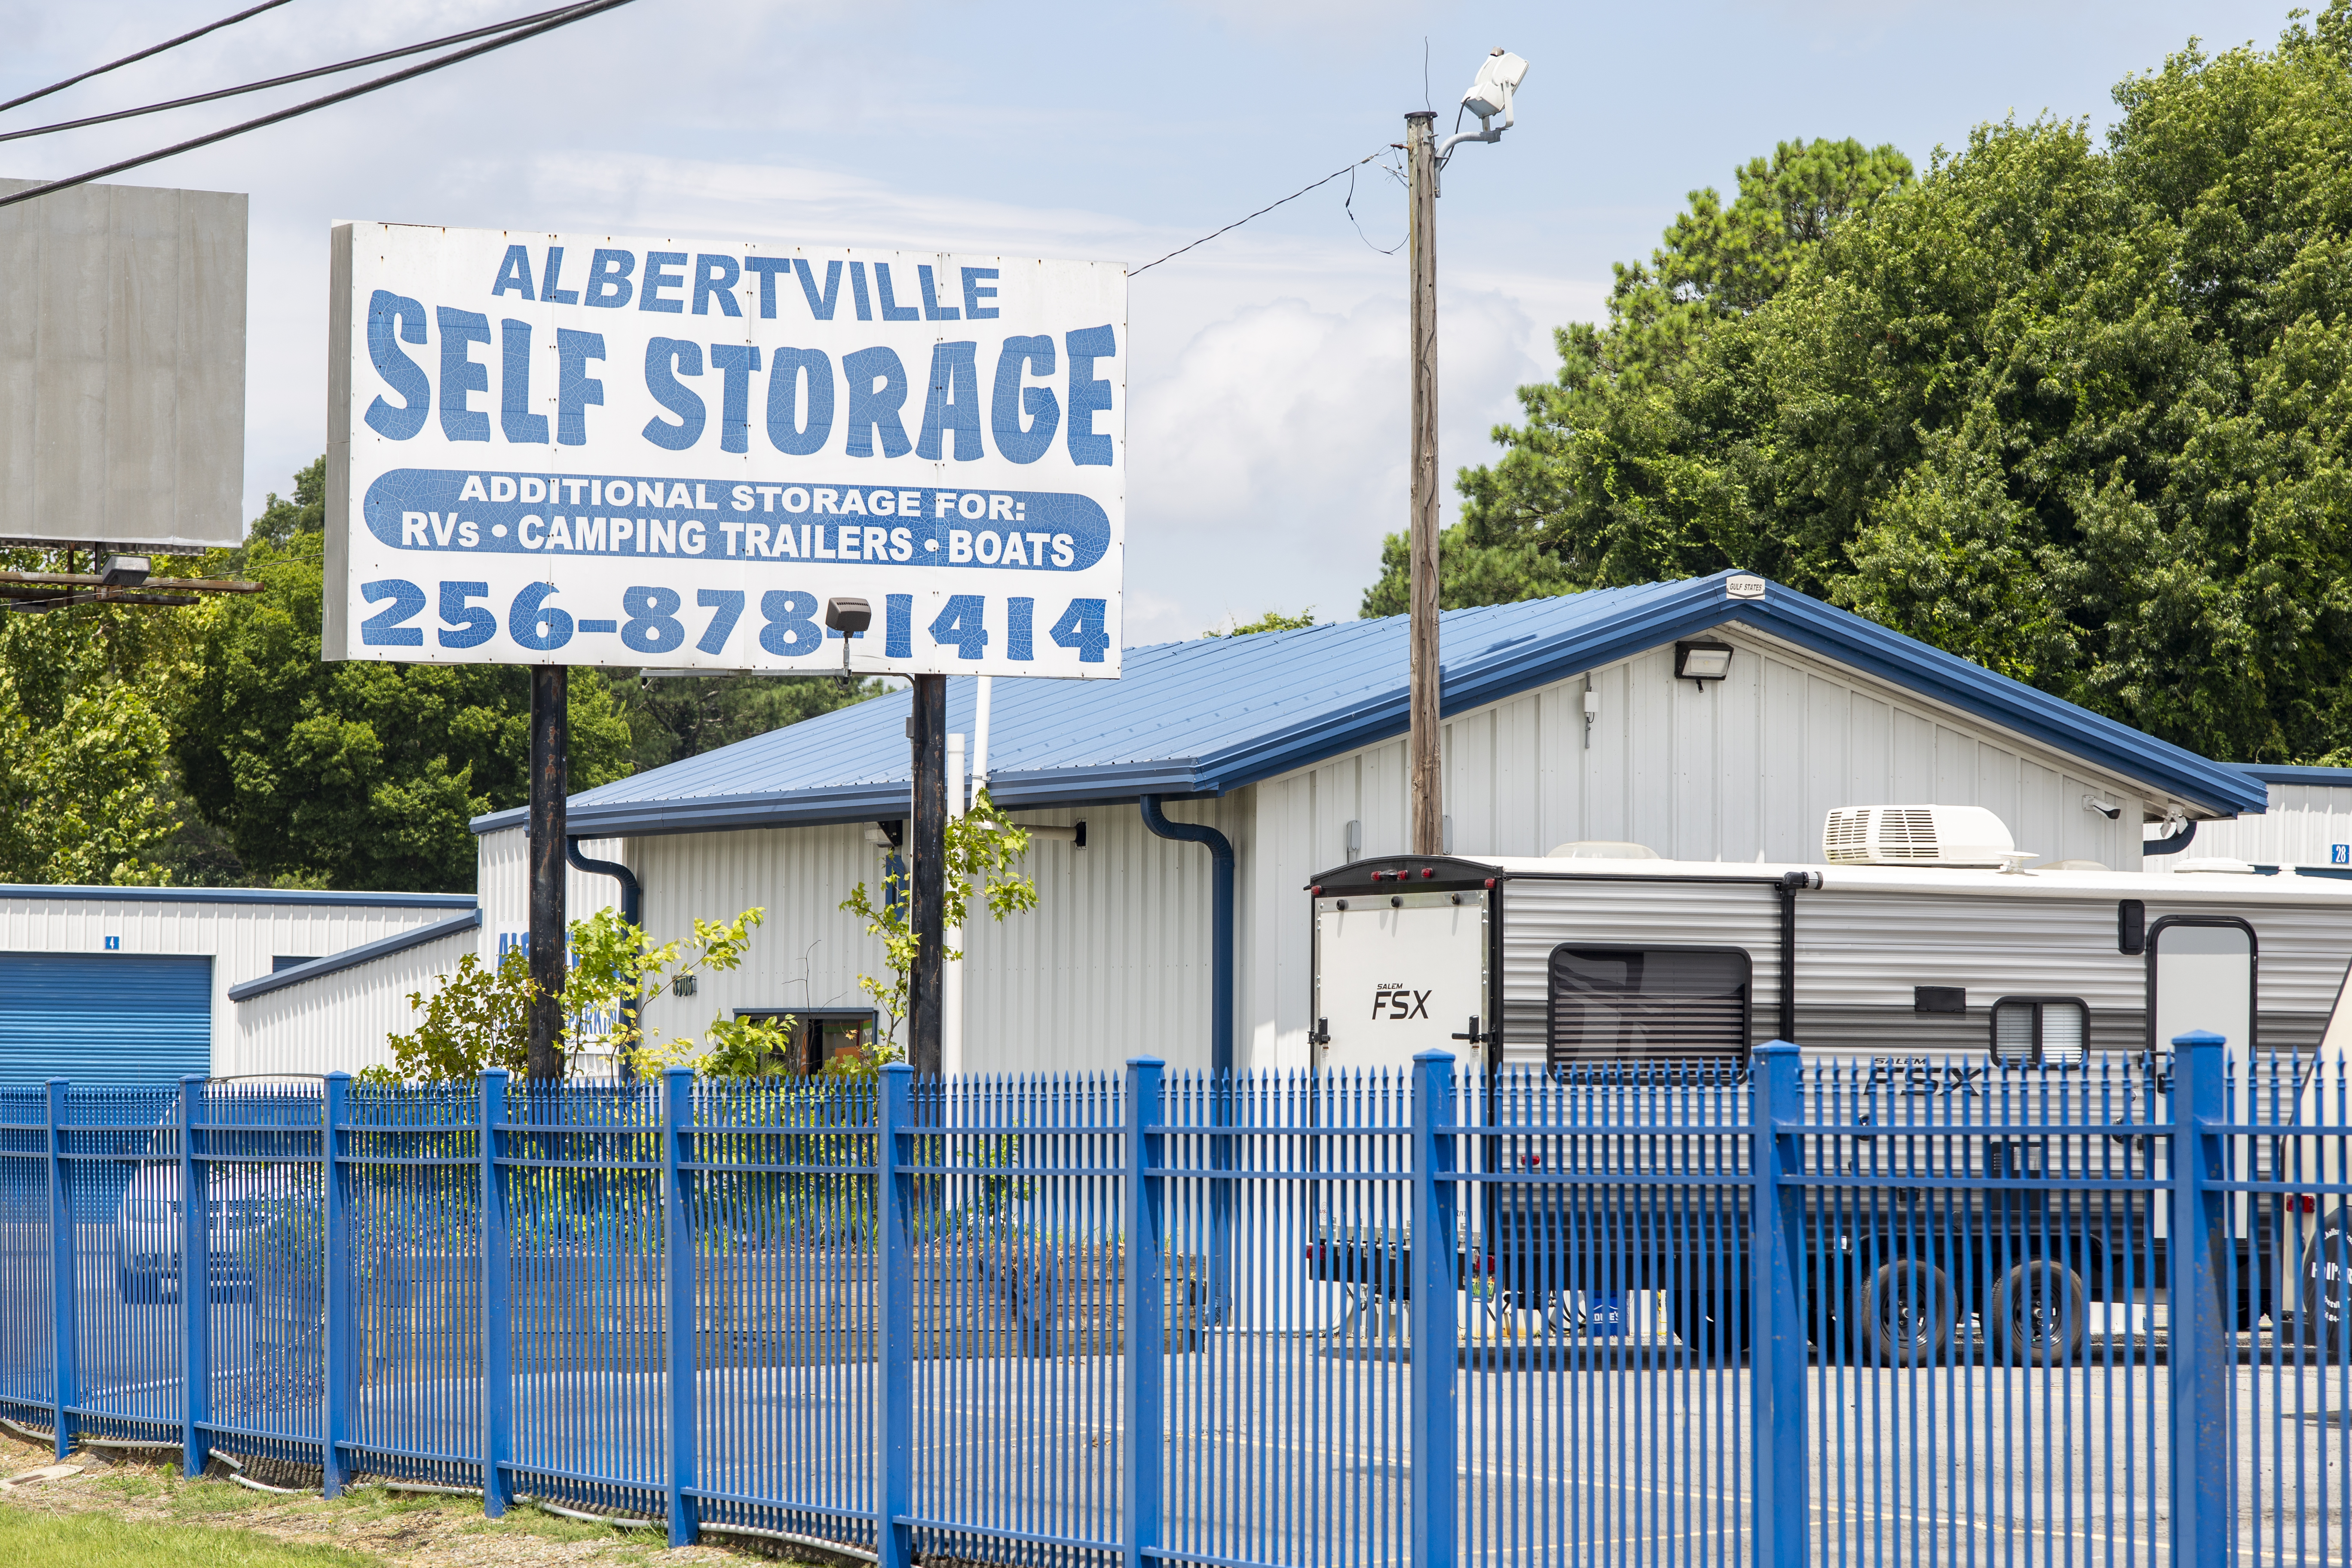 Albertville Self Storage in Albertville, AL